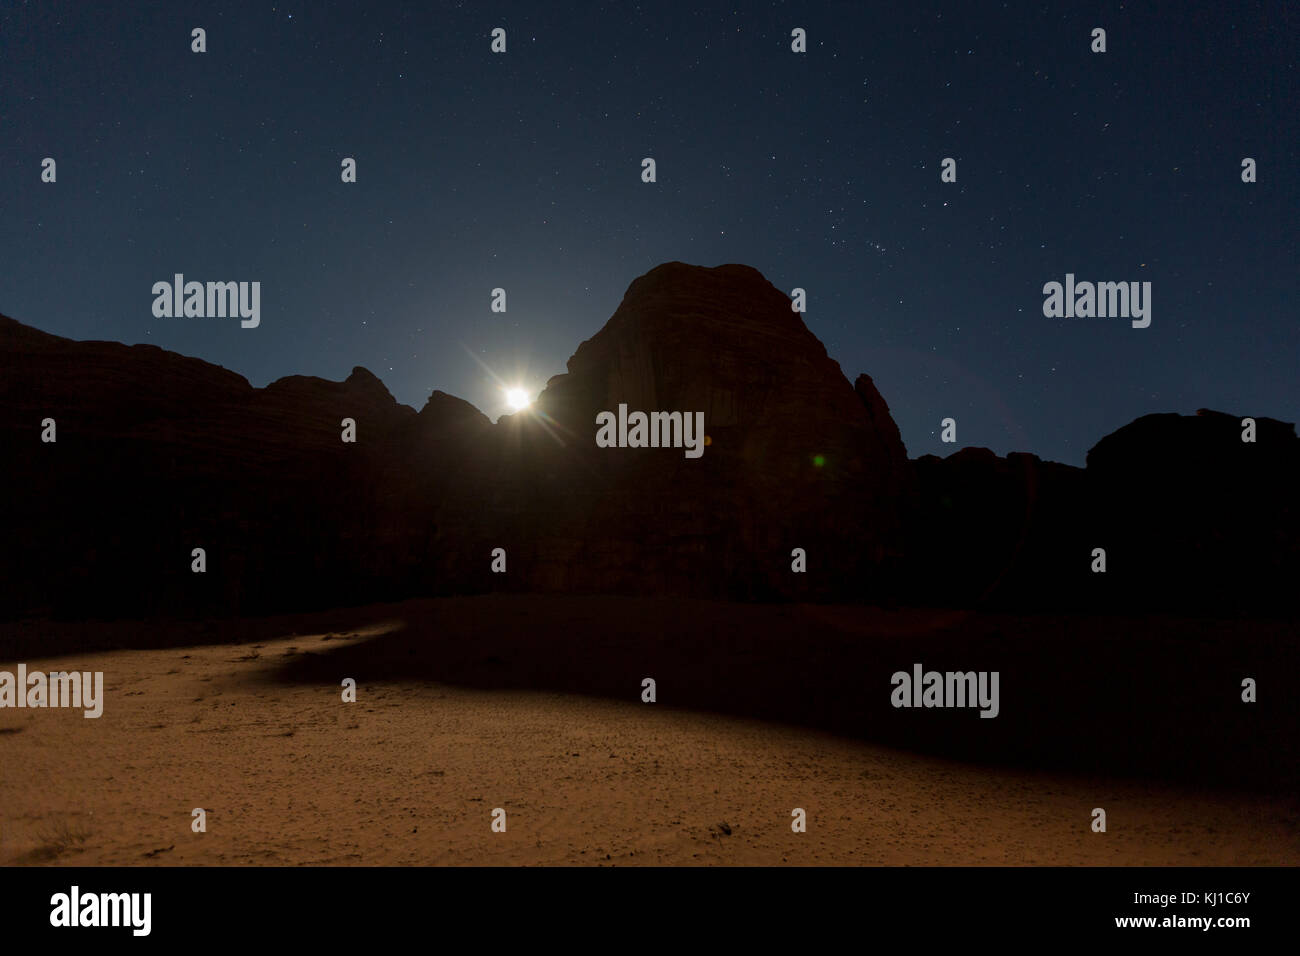 Wadi Rum at night during full moon, Jordan Stock Photo